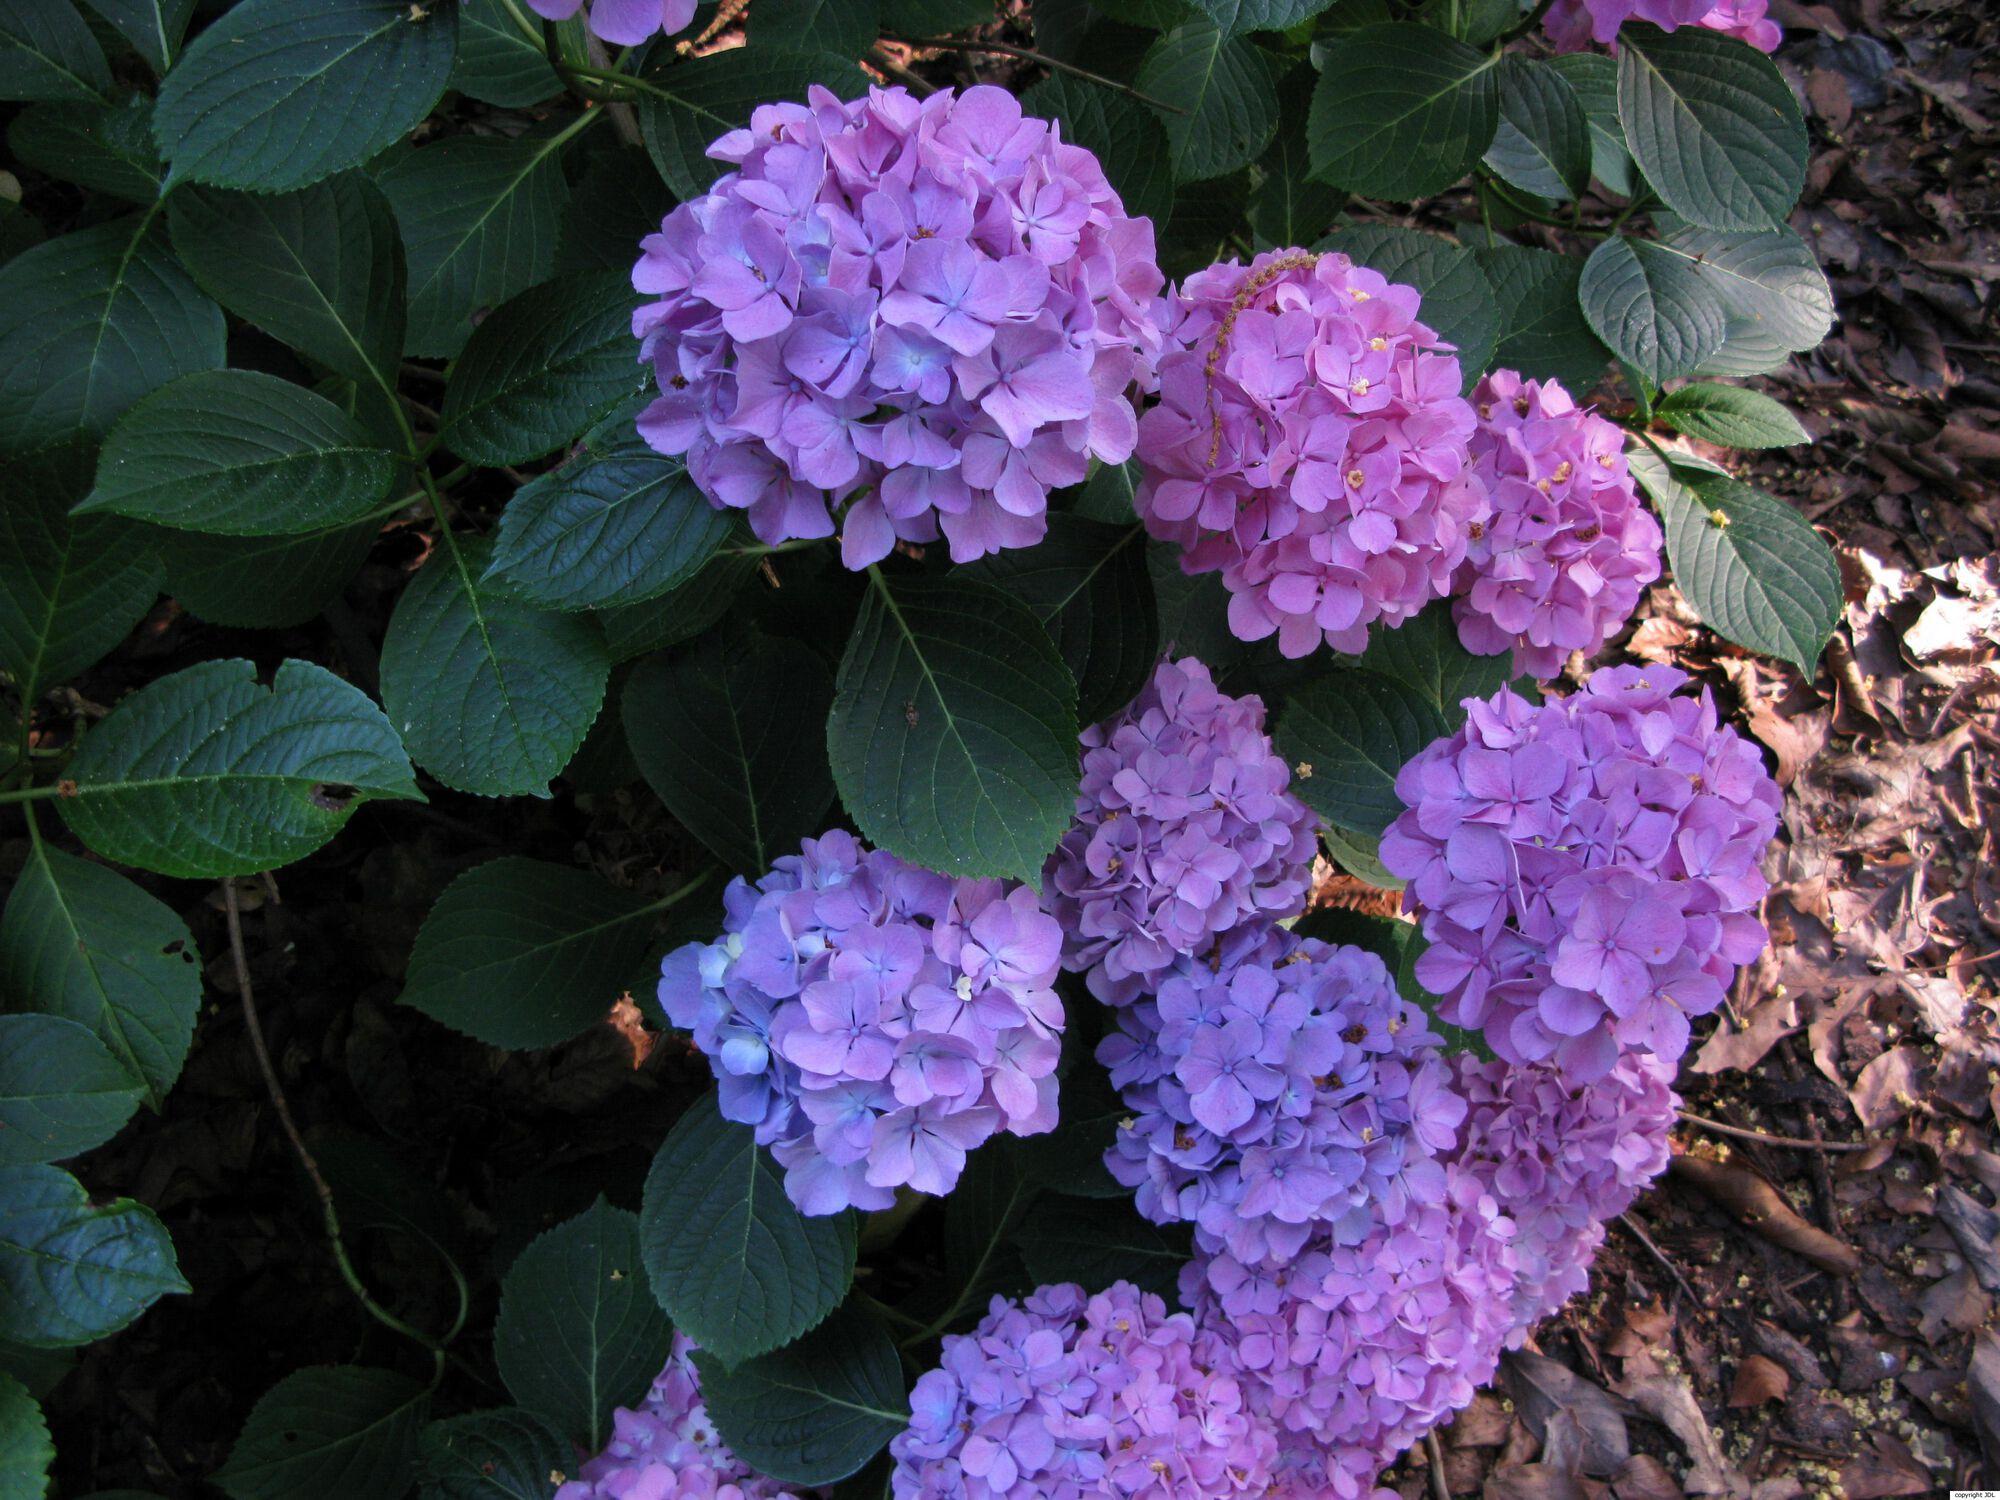 Hydrangea macrophylla (Thunb.) Ser. 'Horben'